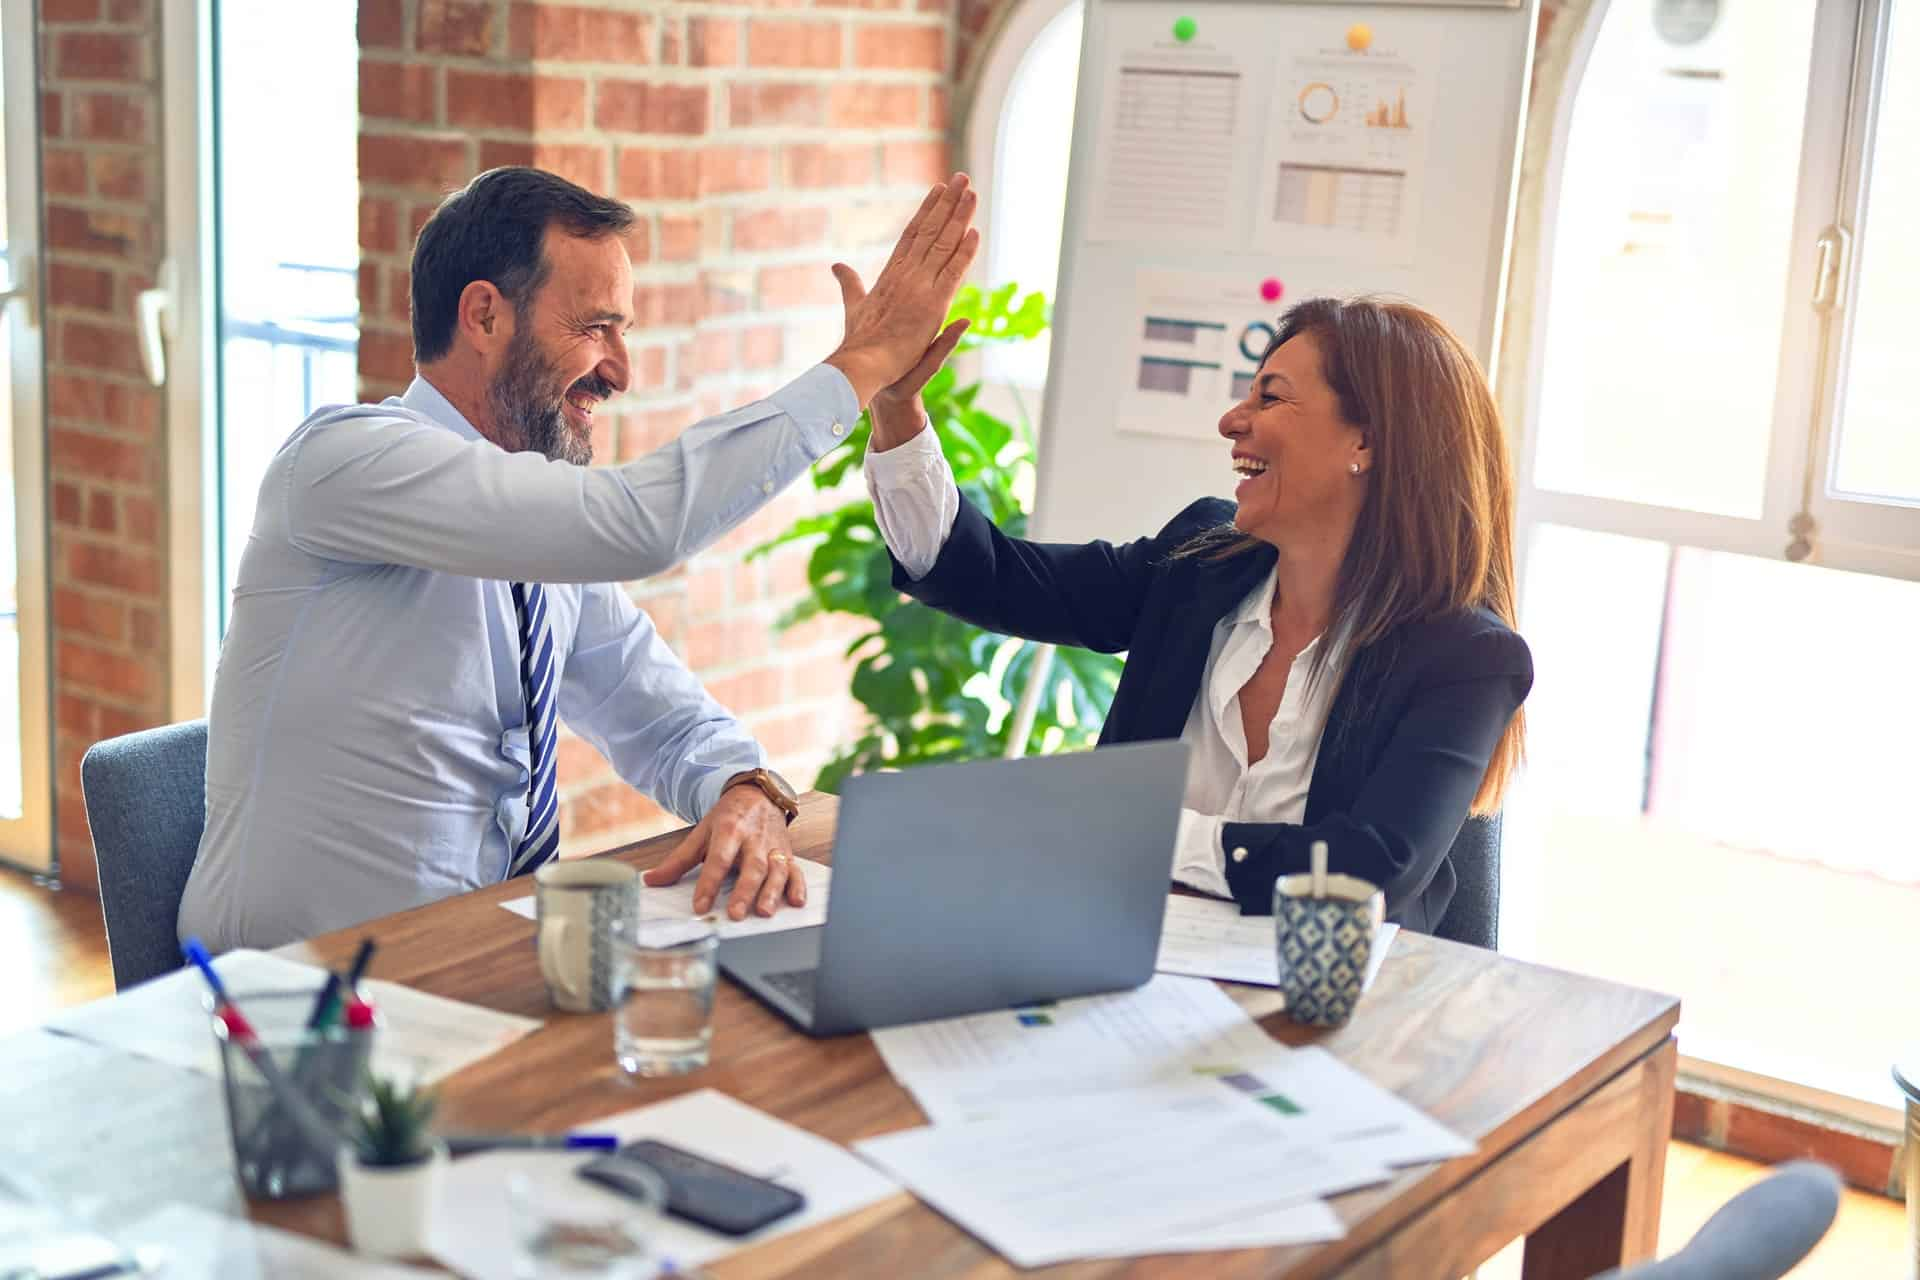 krakenimages 376KN ISplE unsplash How Gender Discrimination Affects Women in the Workplace